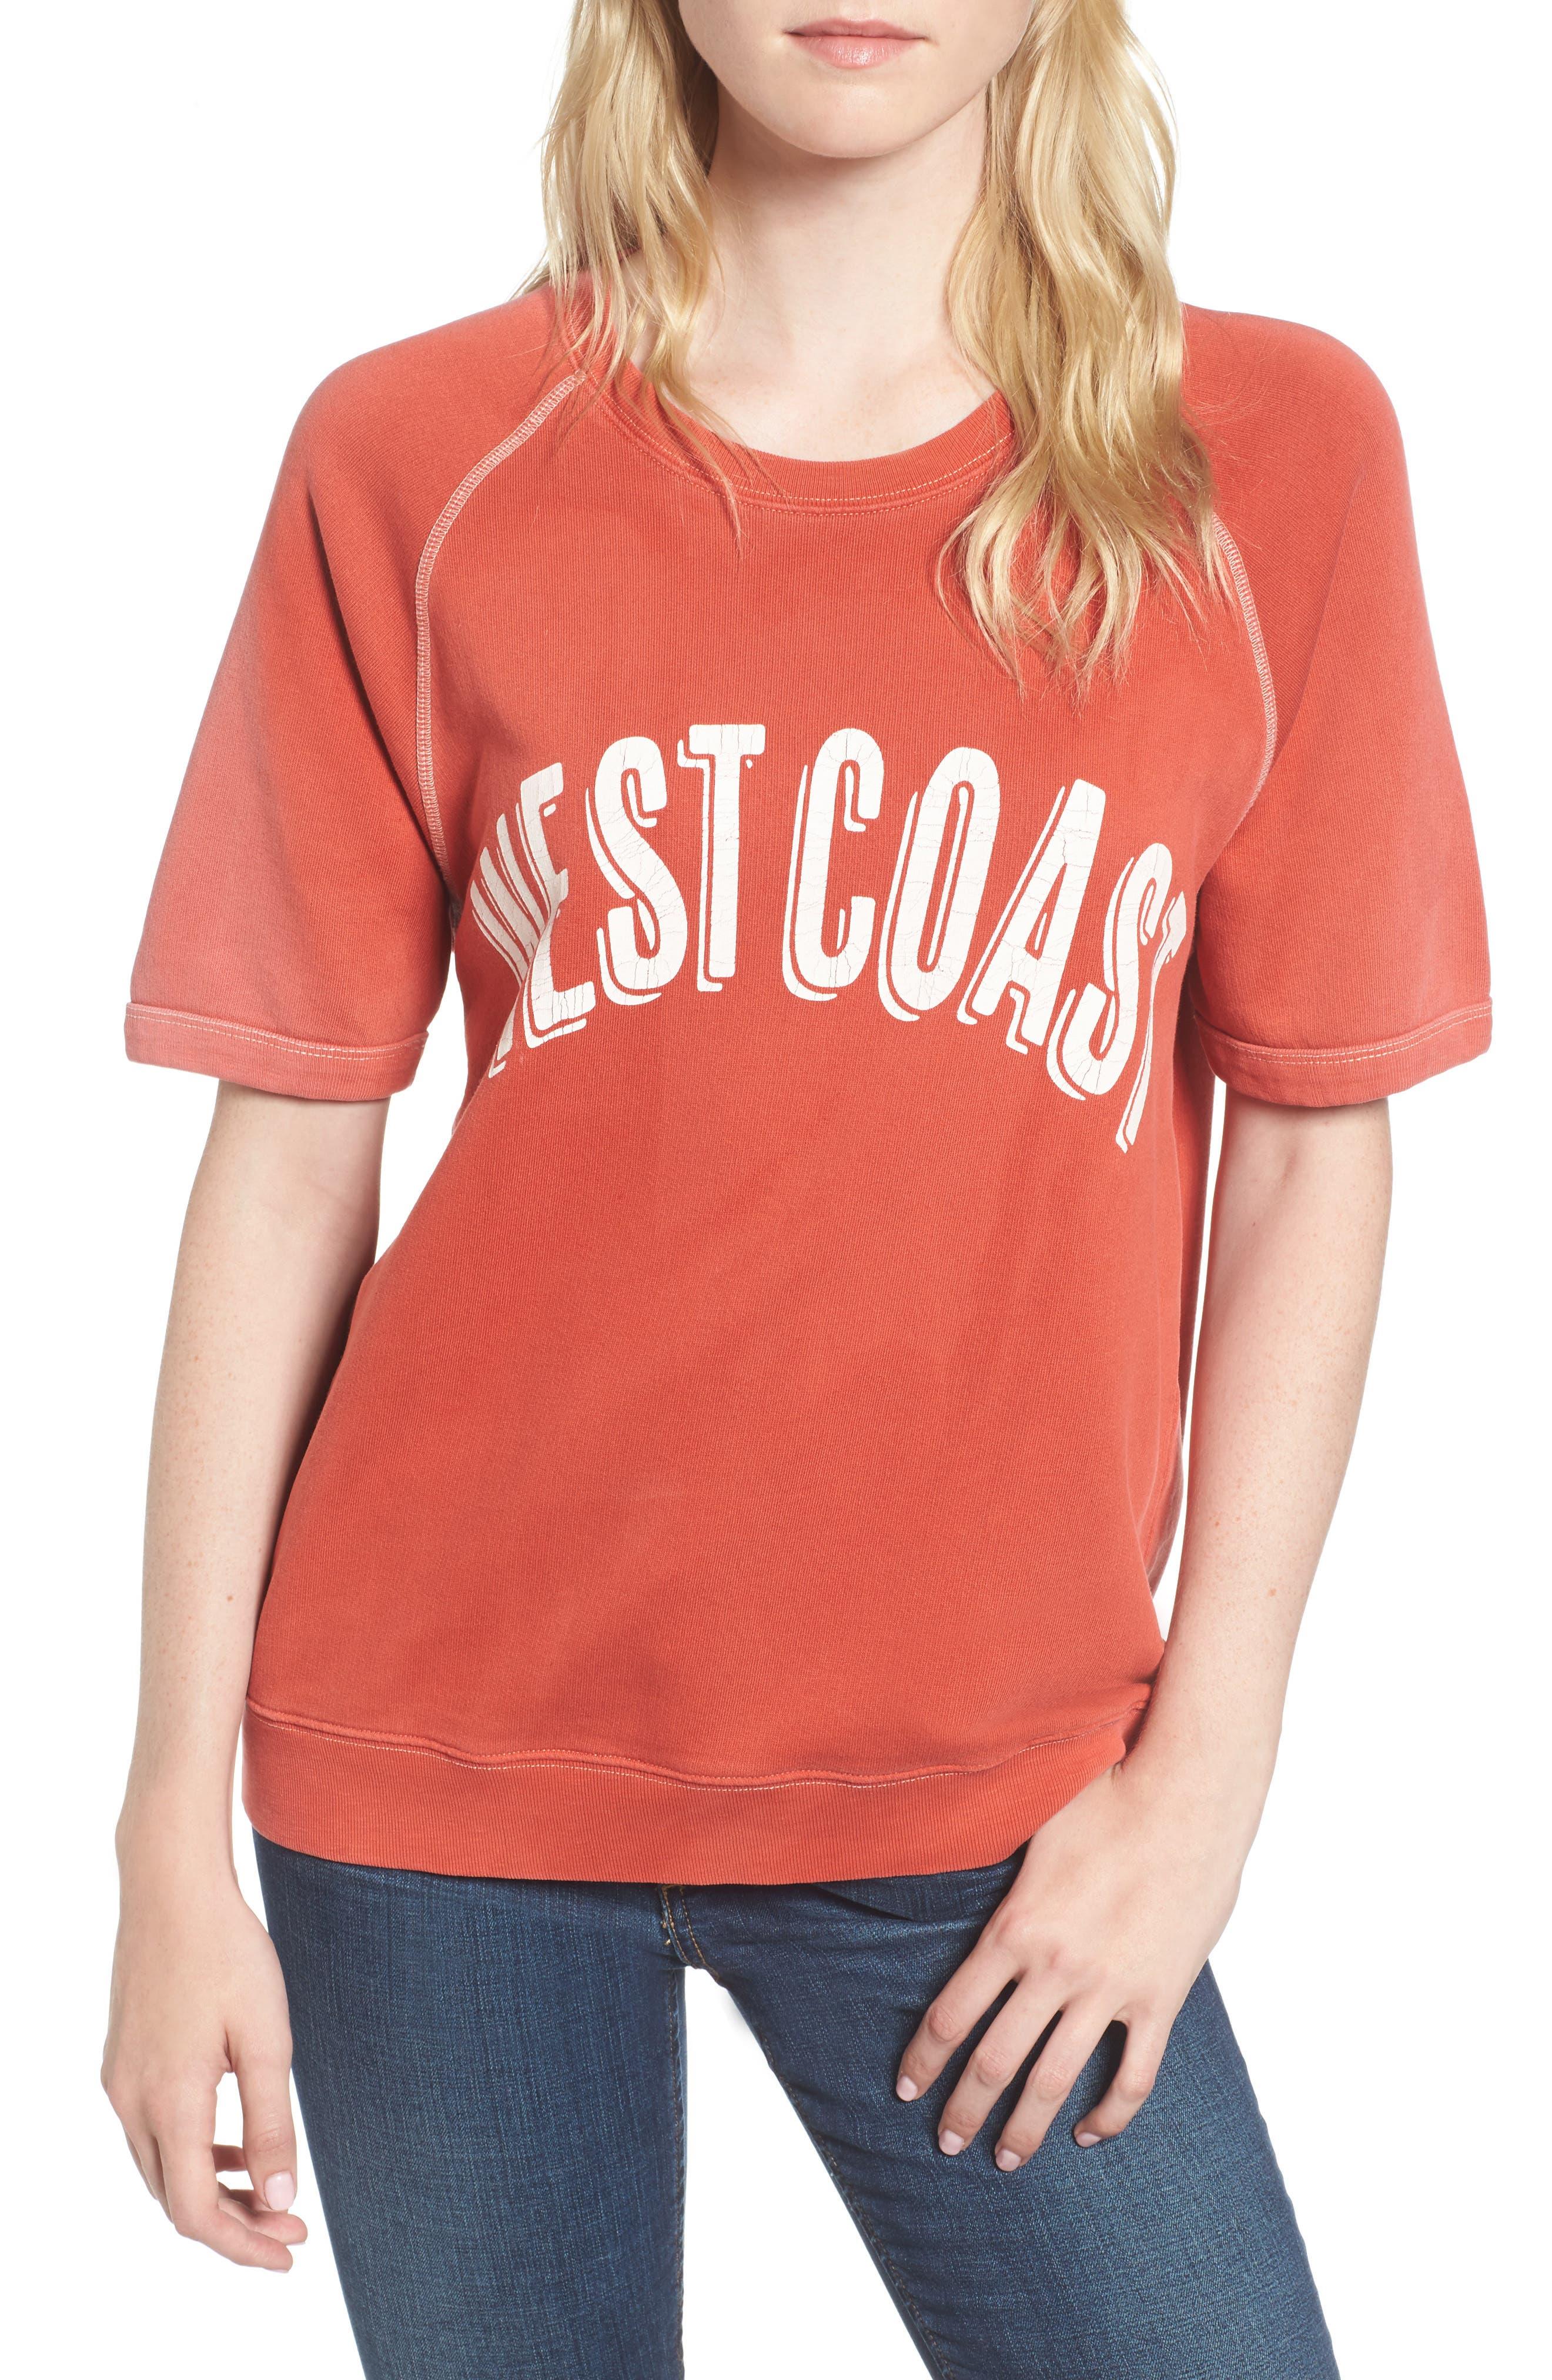 Main Image - Sincerely Jules West Coast Sweatshirt